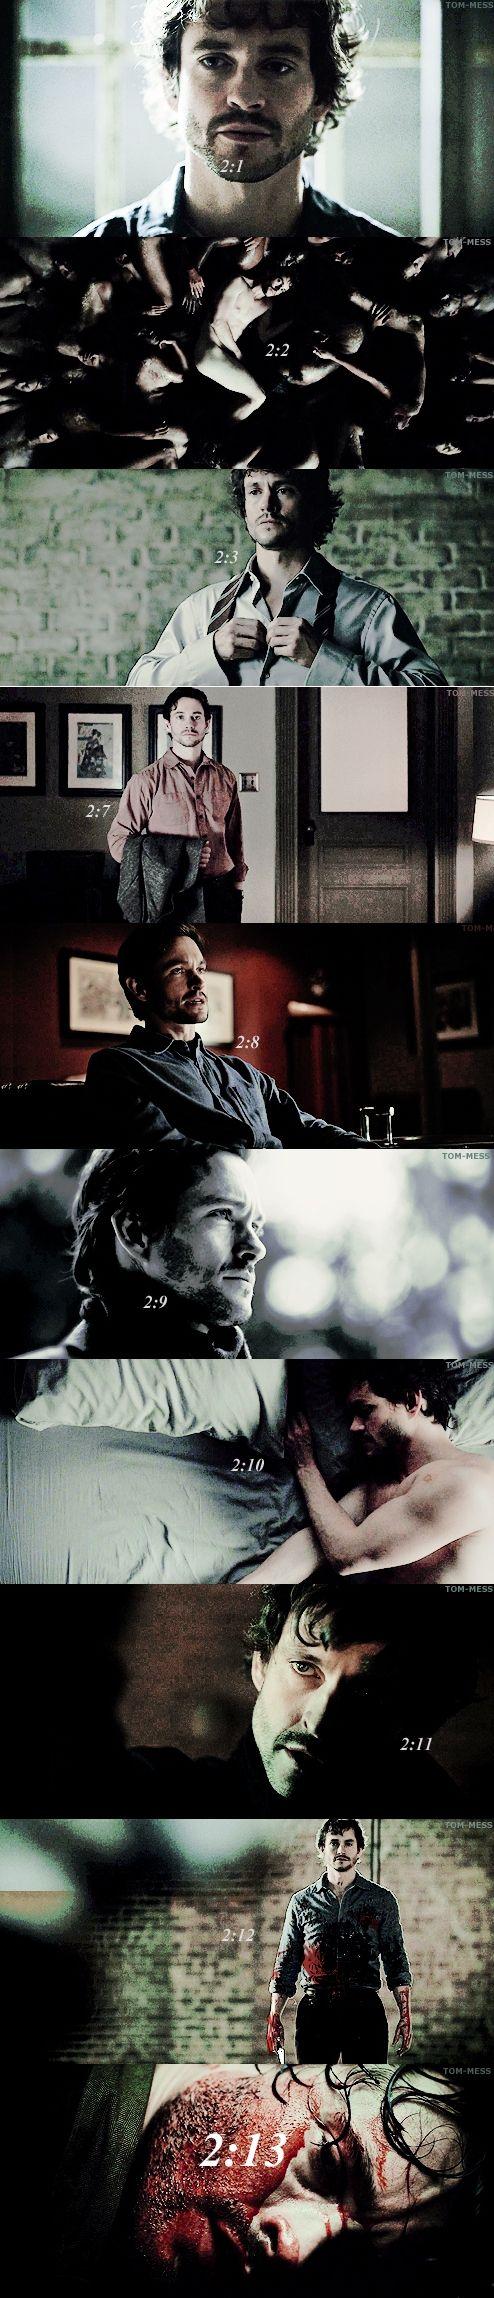 Will Graham in Hannibal Season 2 : Episode 1 to 13.